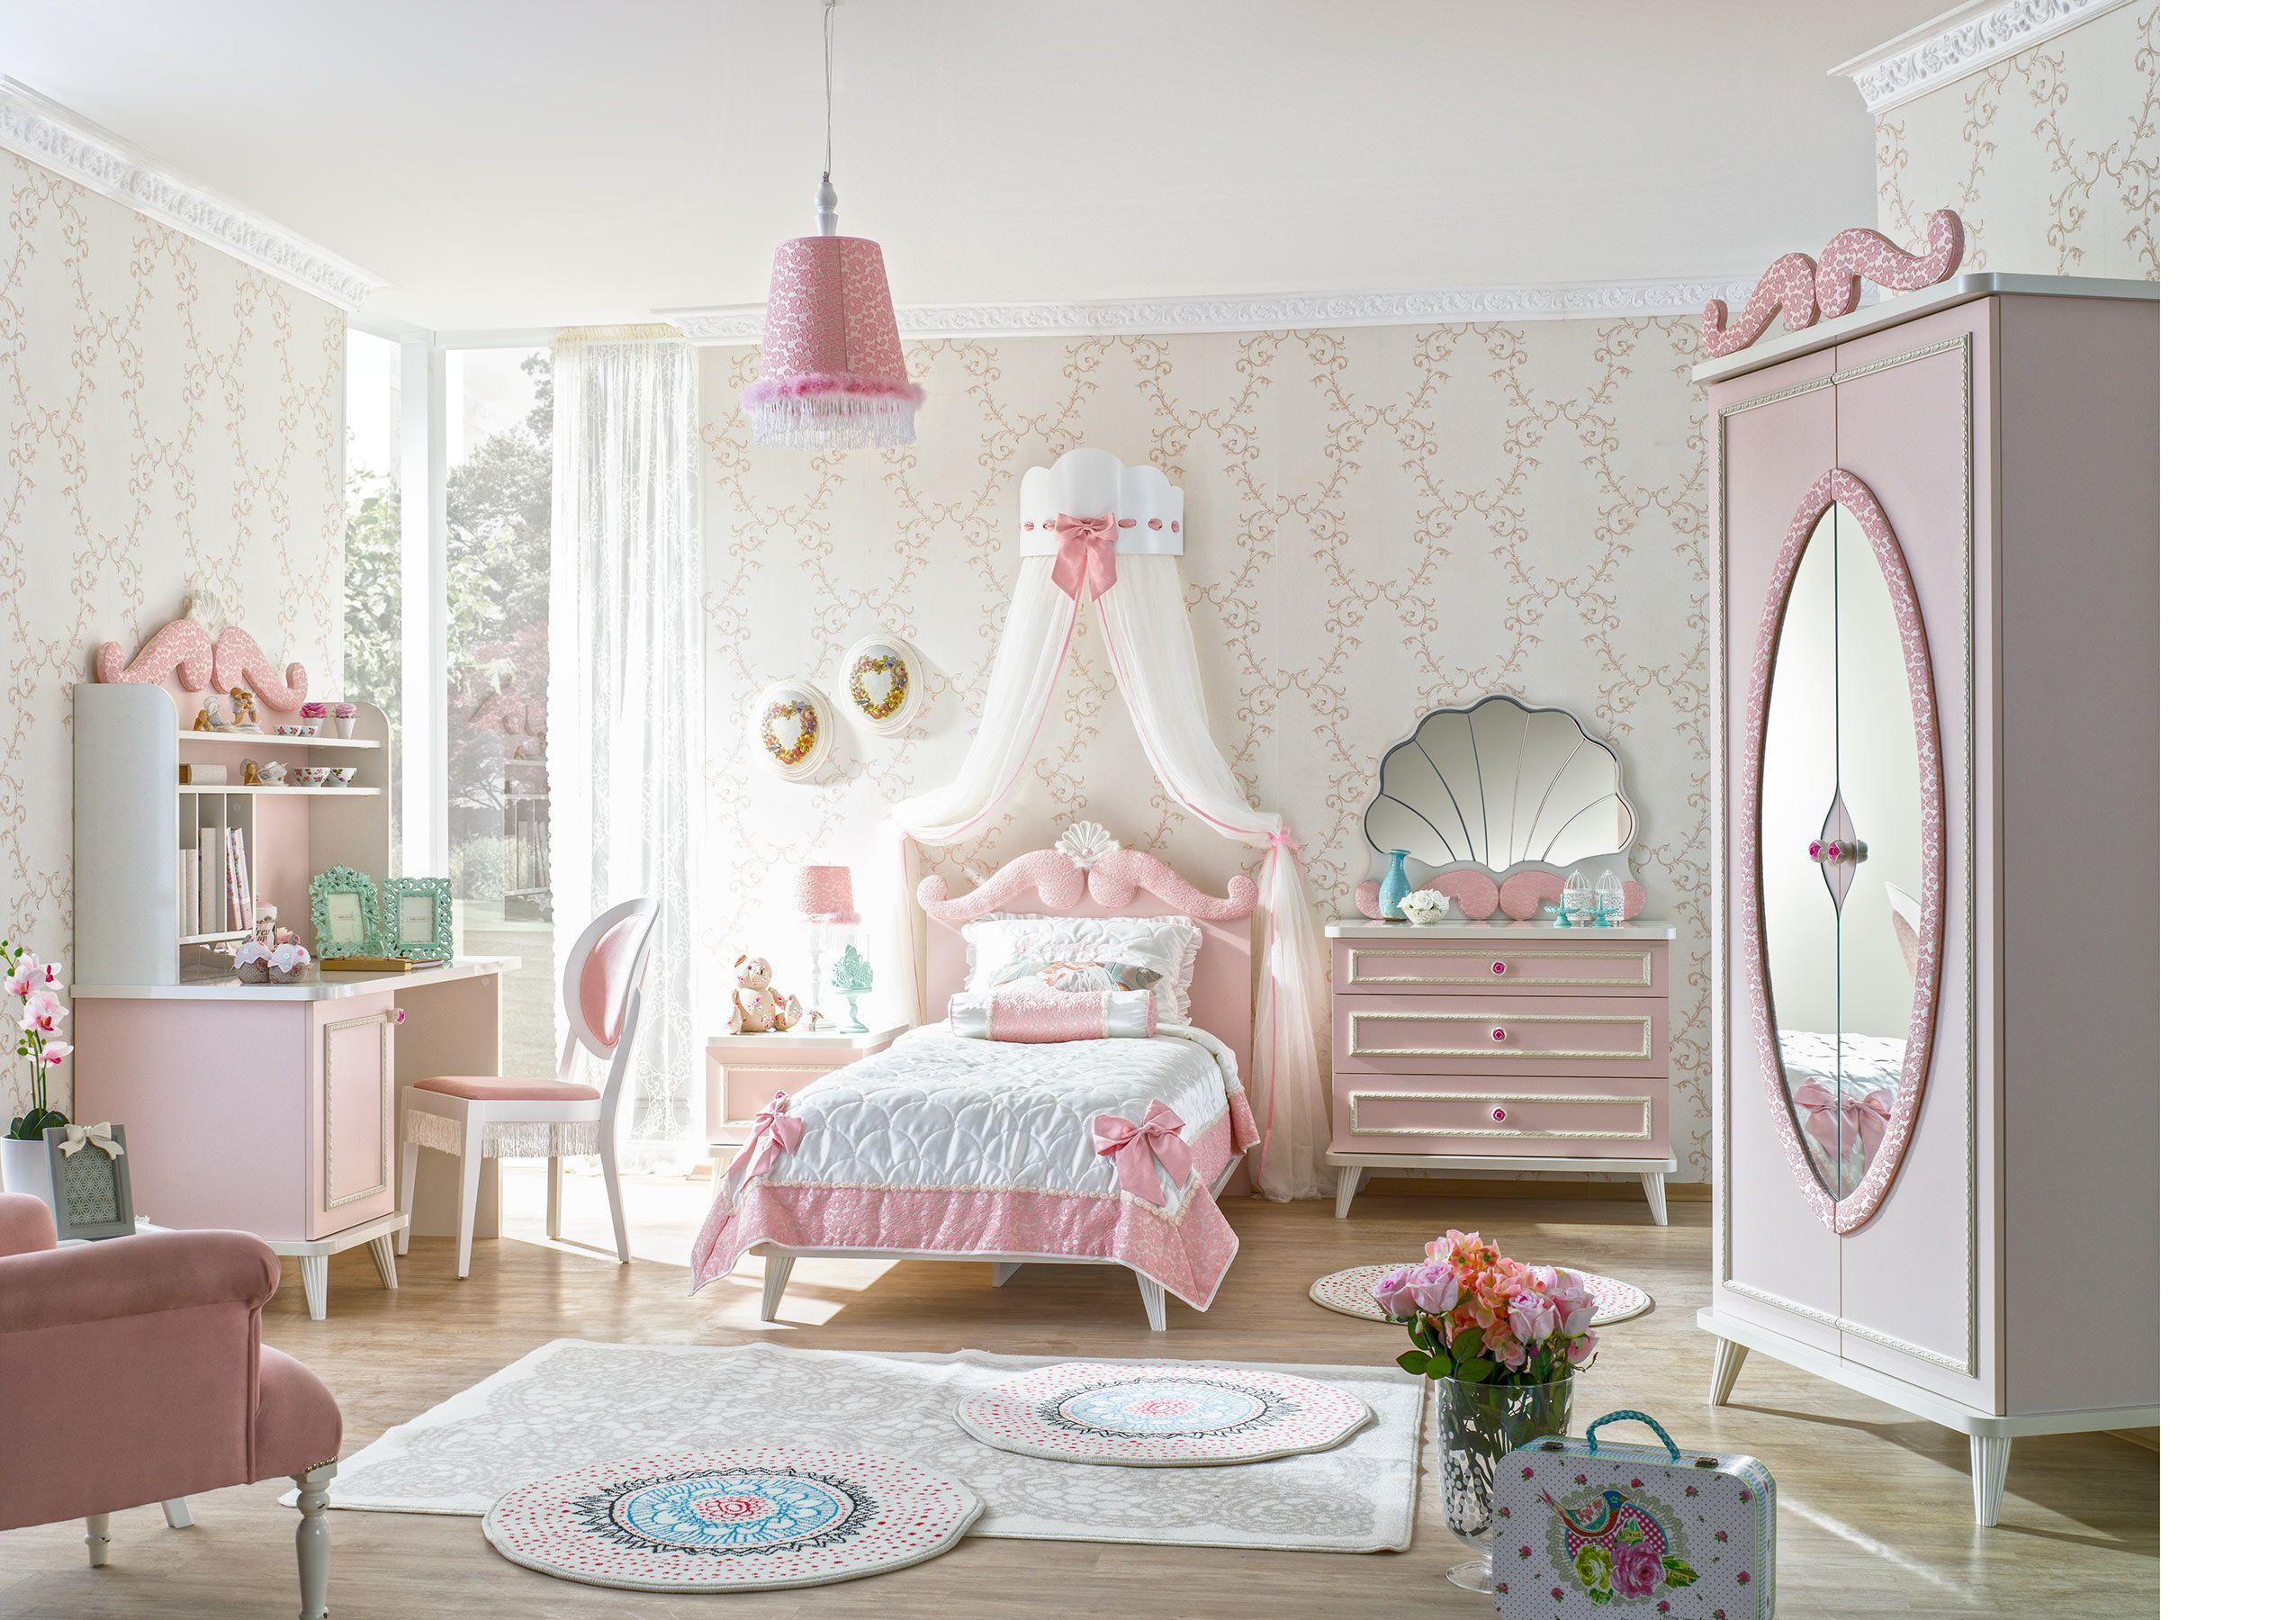 Kinderzimmer Mädchenzimmer ROSA Prinzessin Fein